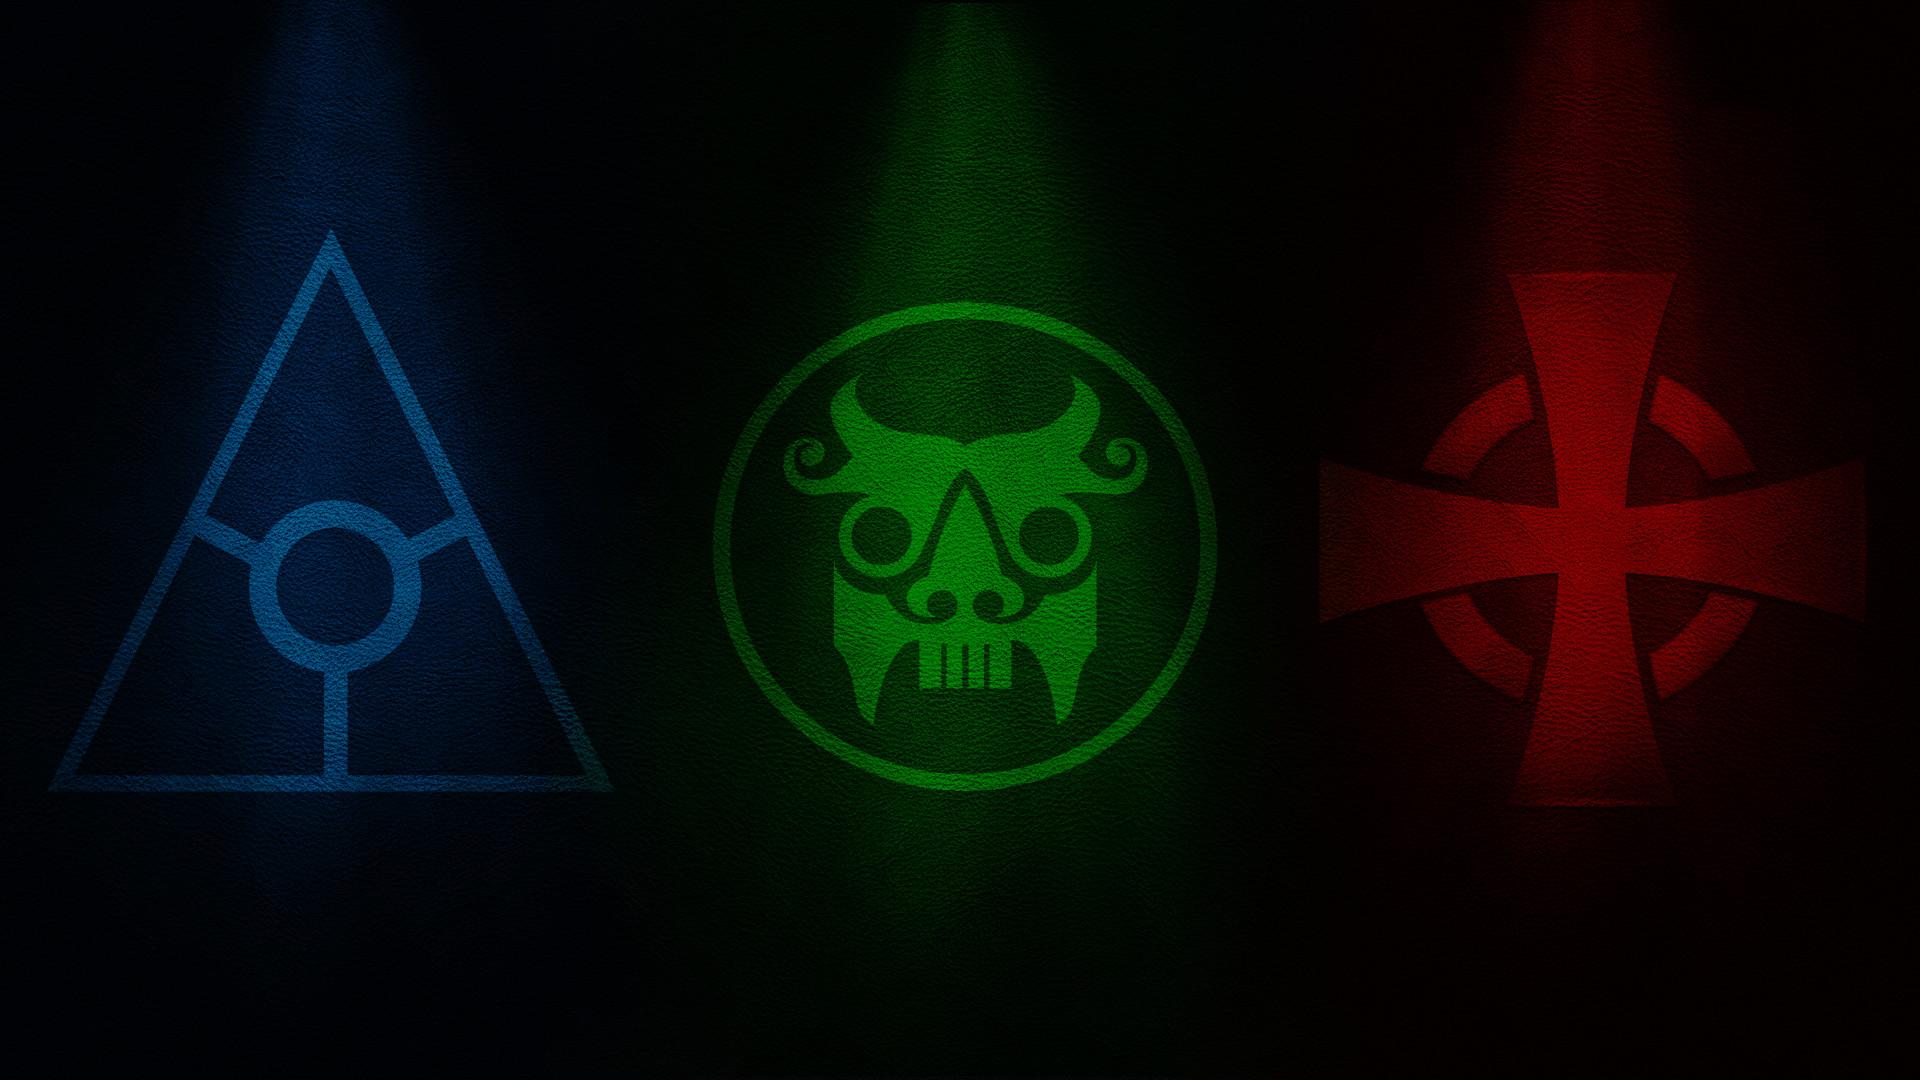 Combo Symbol The Secret World Wallpaper by BlackLotusXX on .